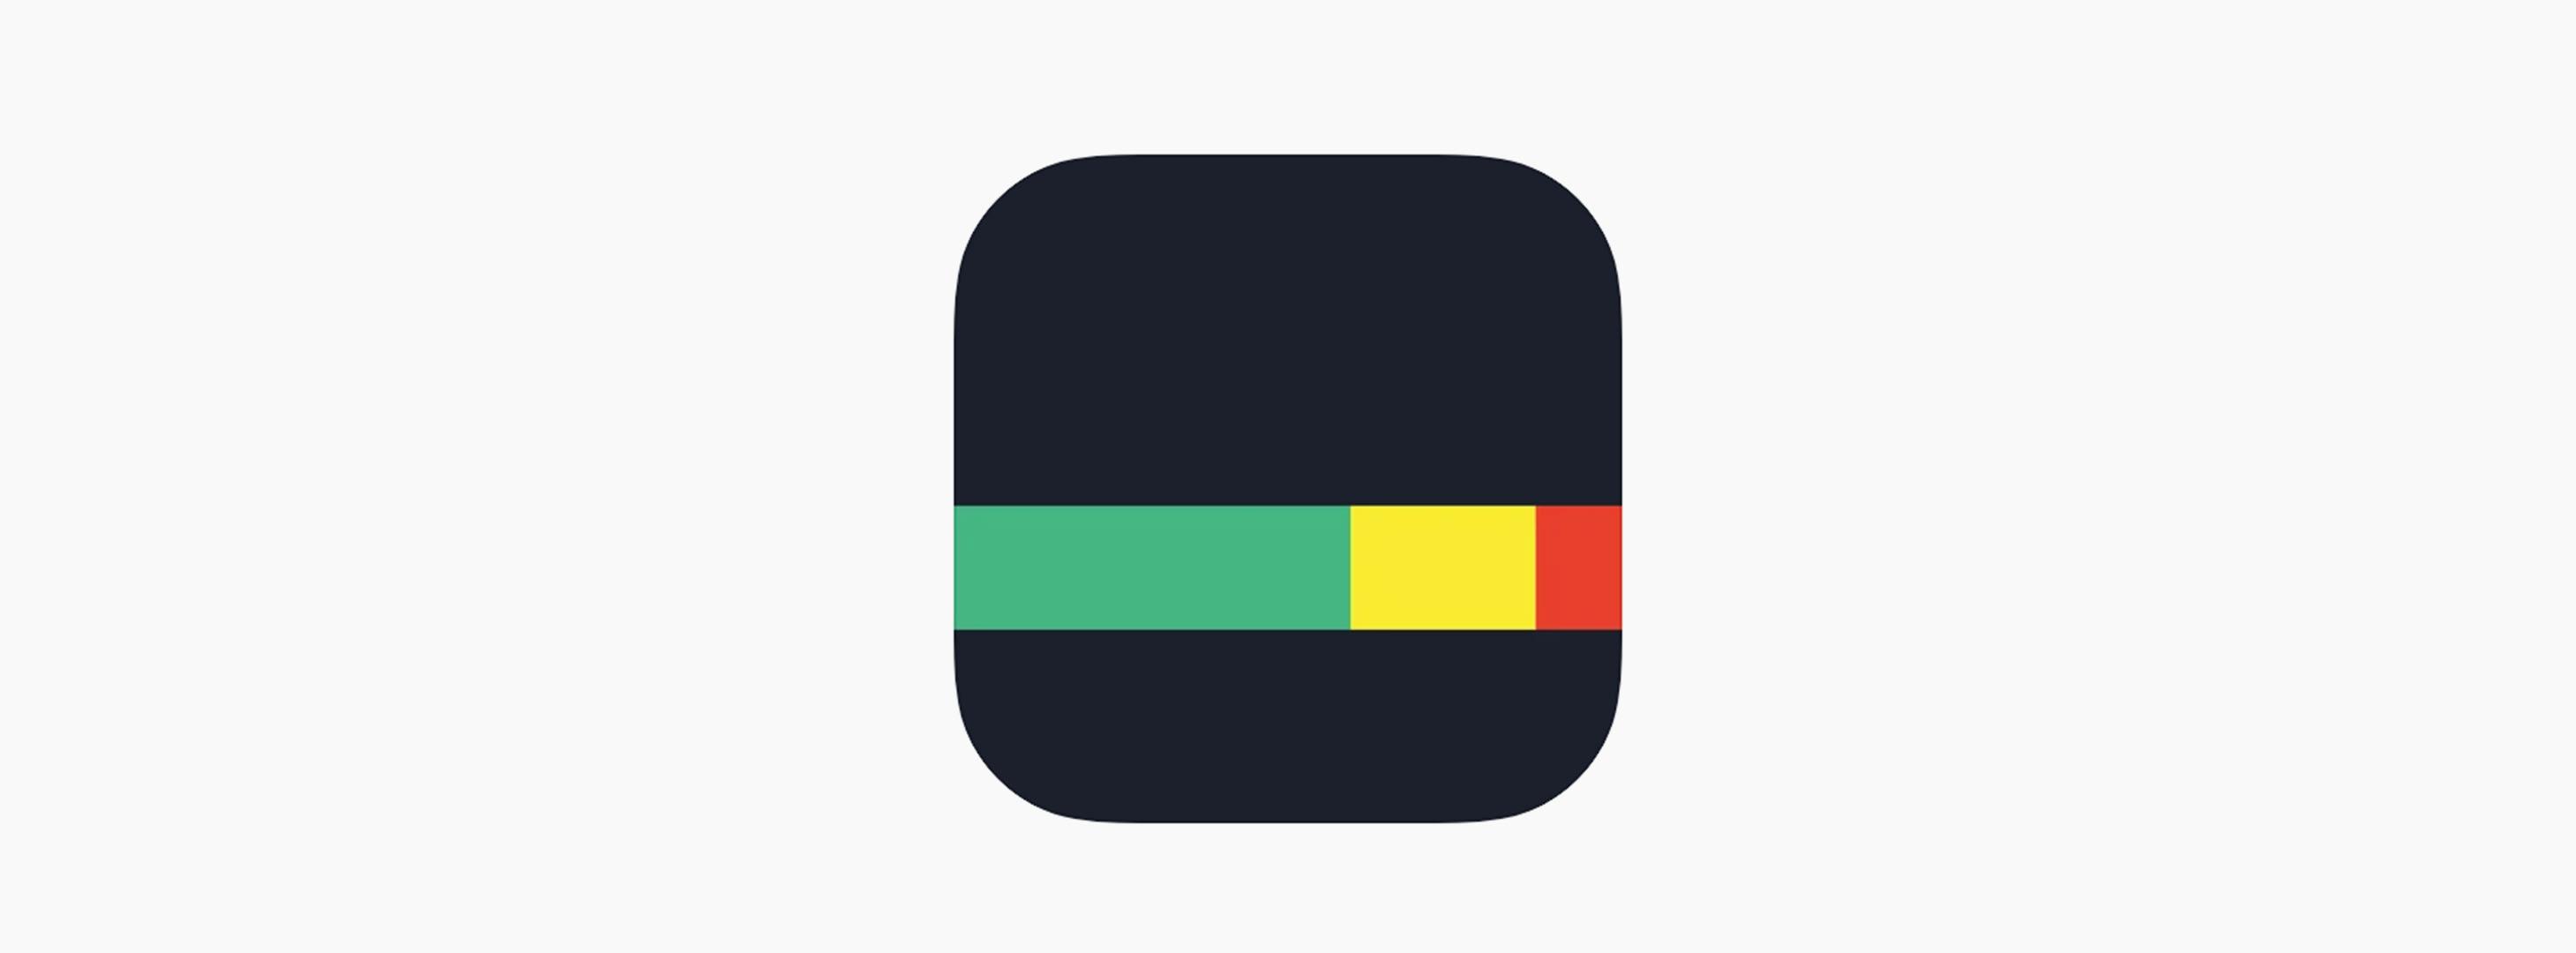 allapplenews-must-have-apple-watch-series-6-apps